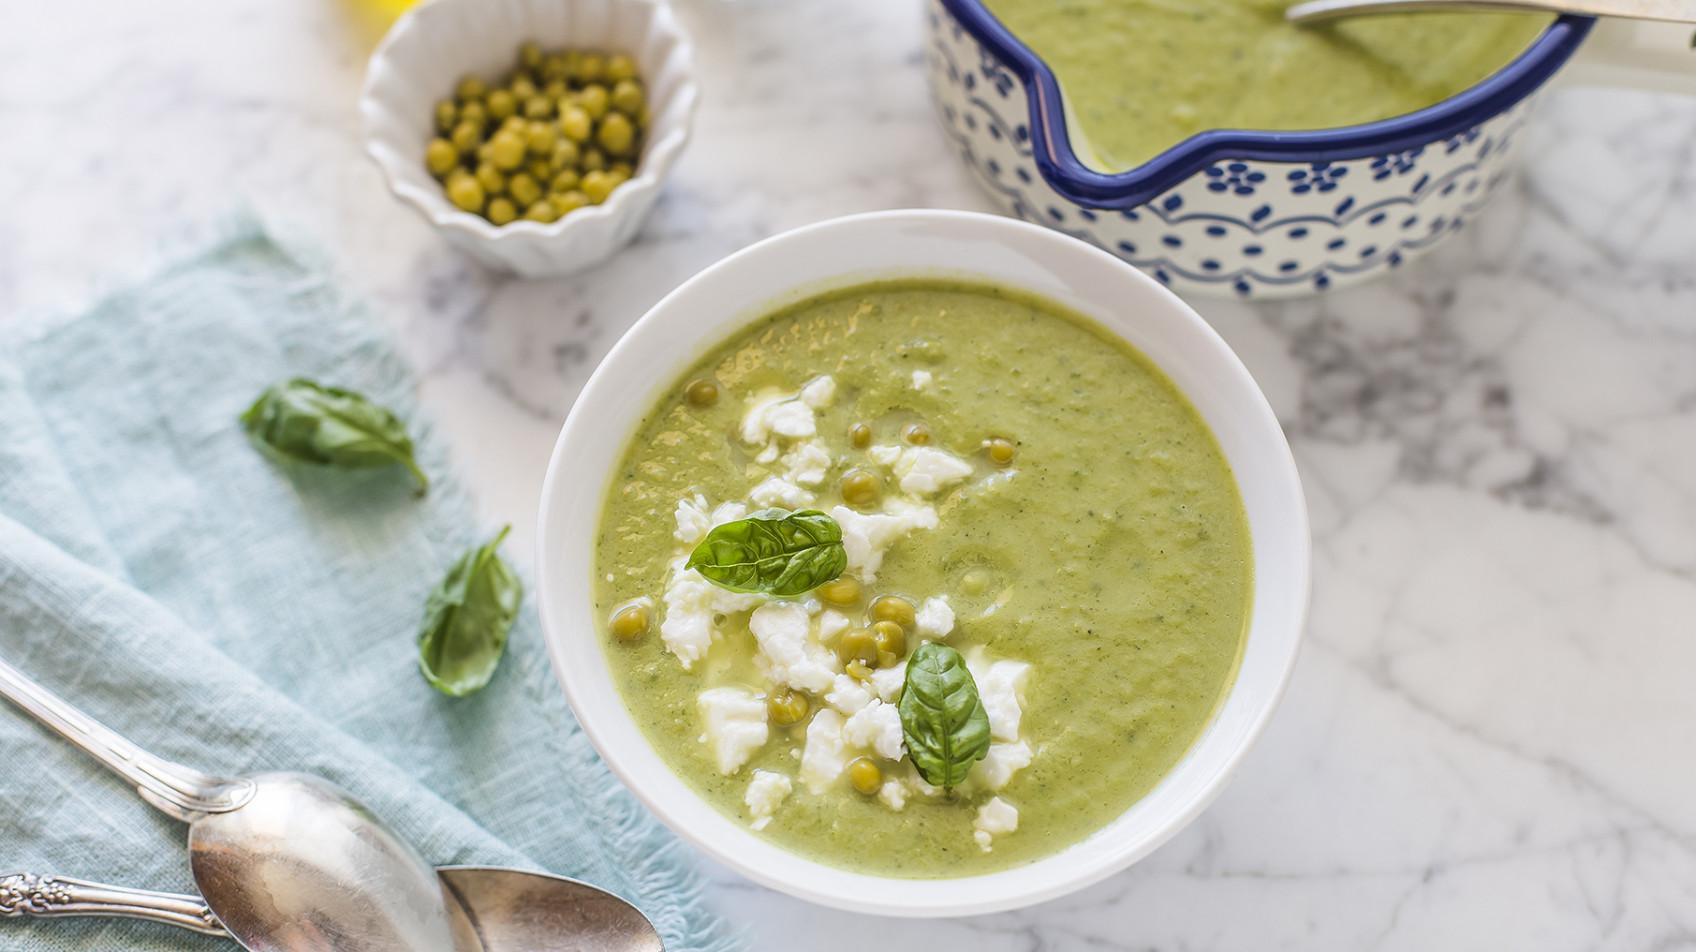 Zuppa fredda di piselli e zucchine